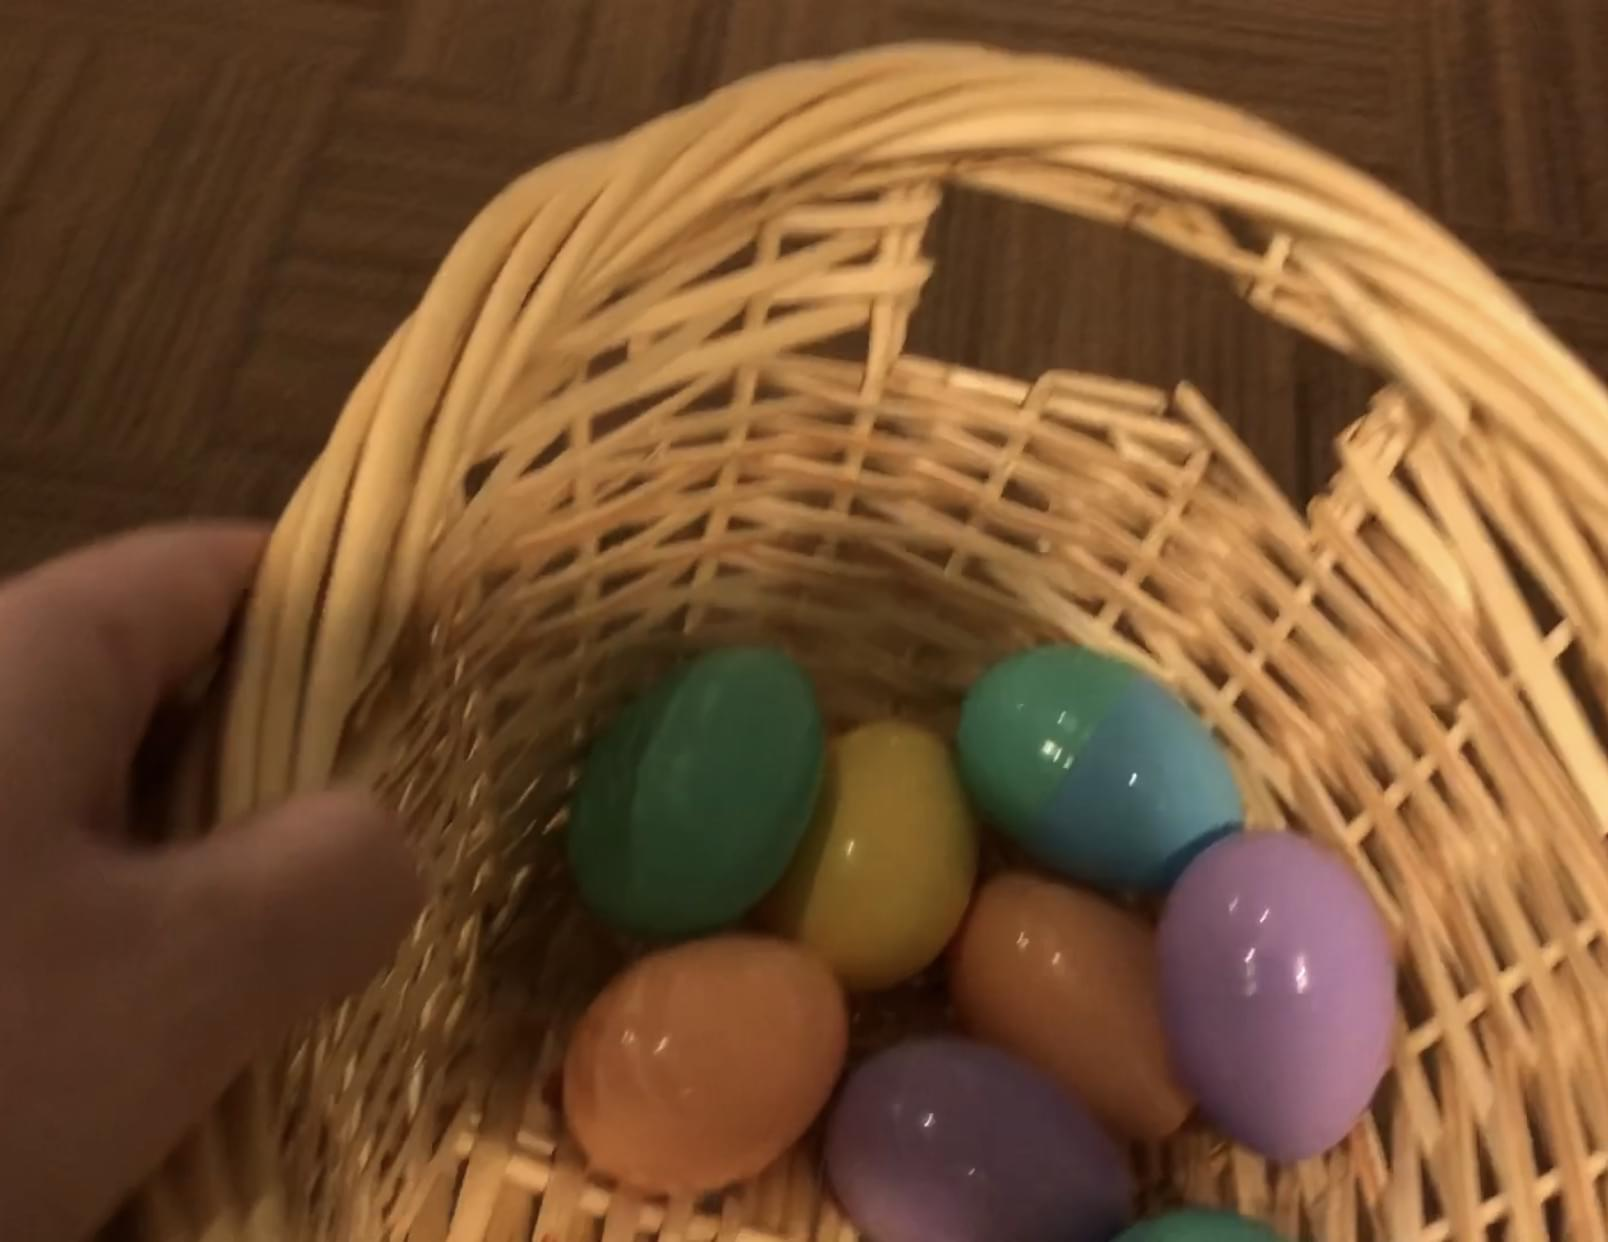 WATCH: Office Easter Egg Hunt